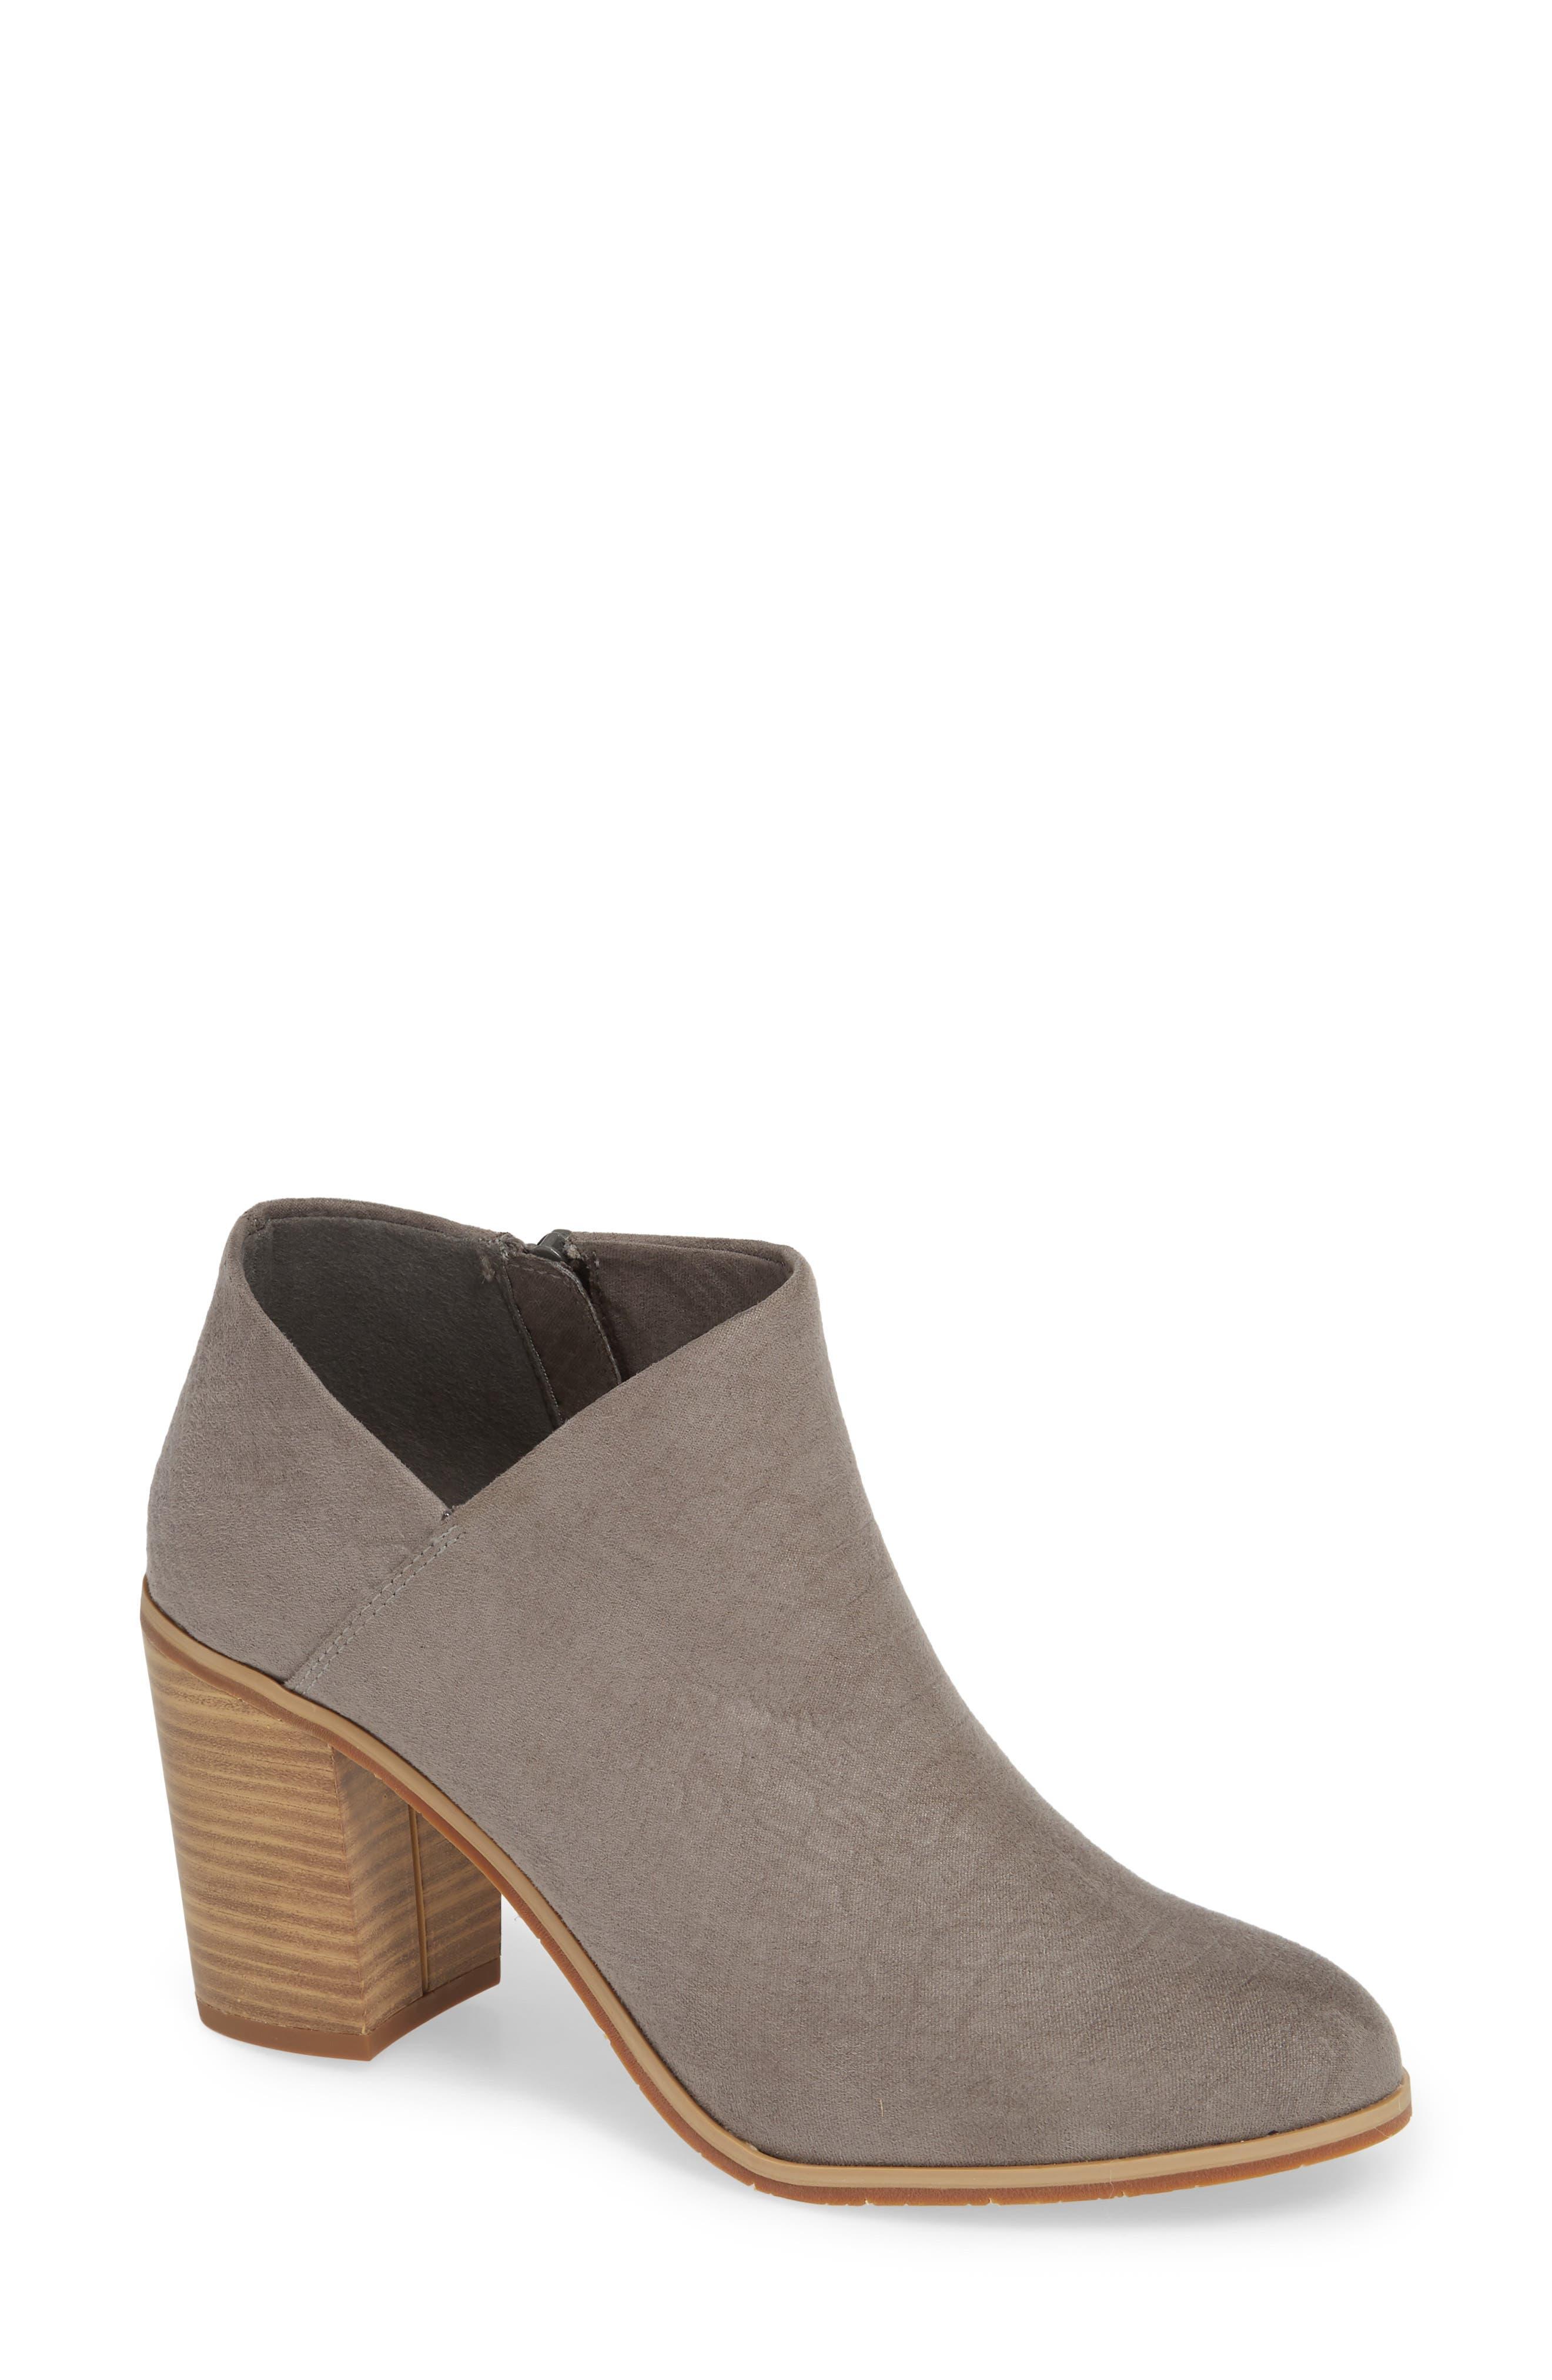 BC FOOTWEAR Kettle Block Heel Bootie, Main, color, GREY VEGAN SUEDE